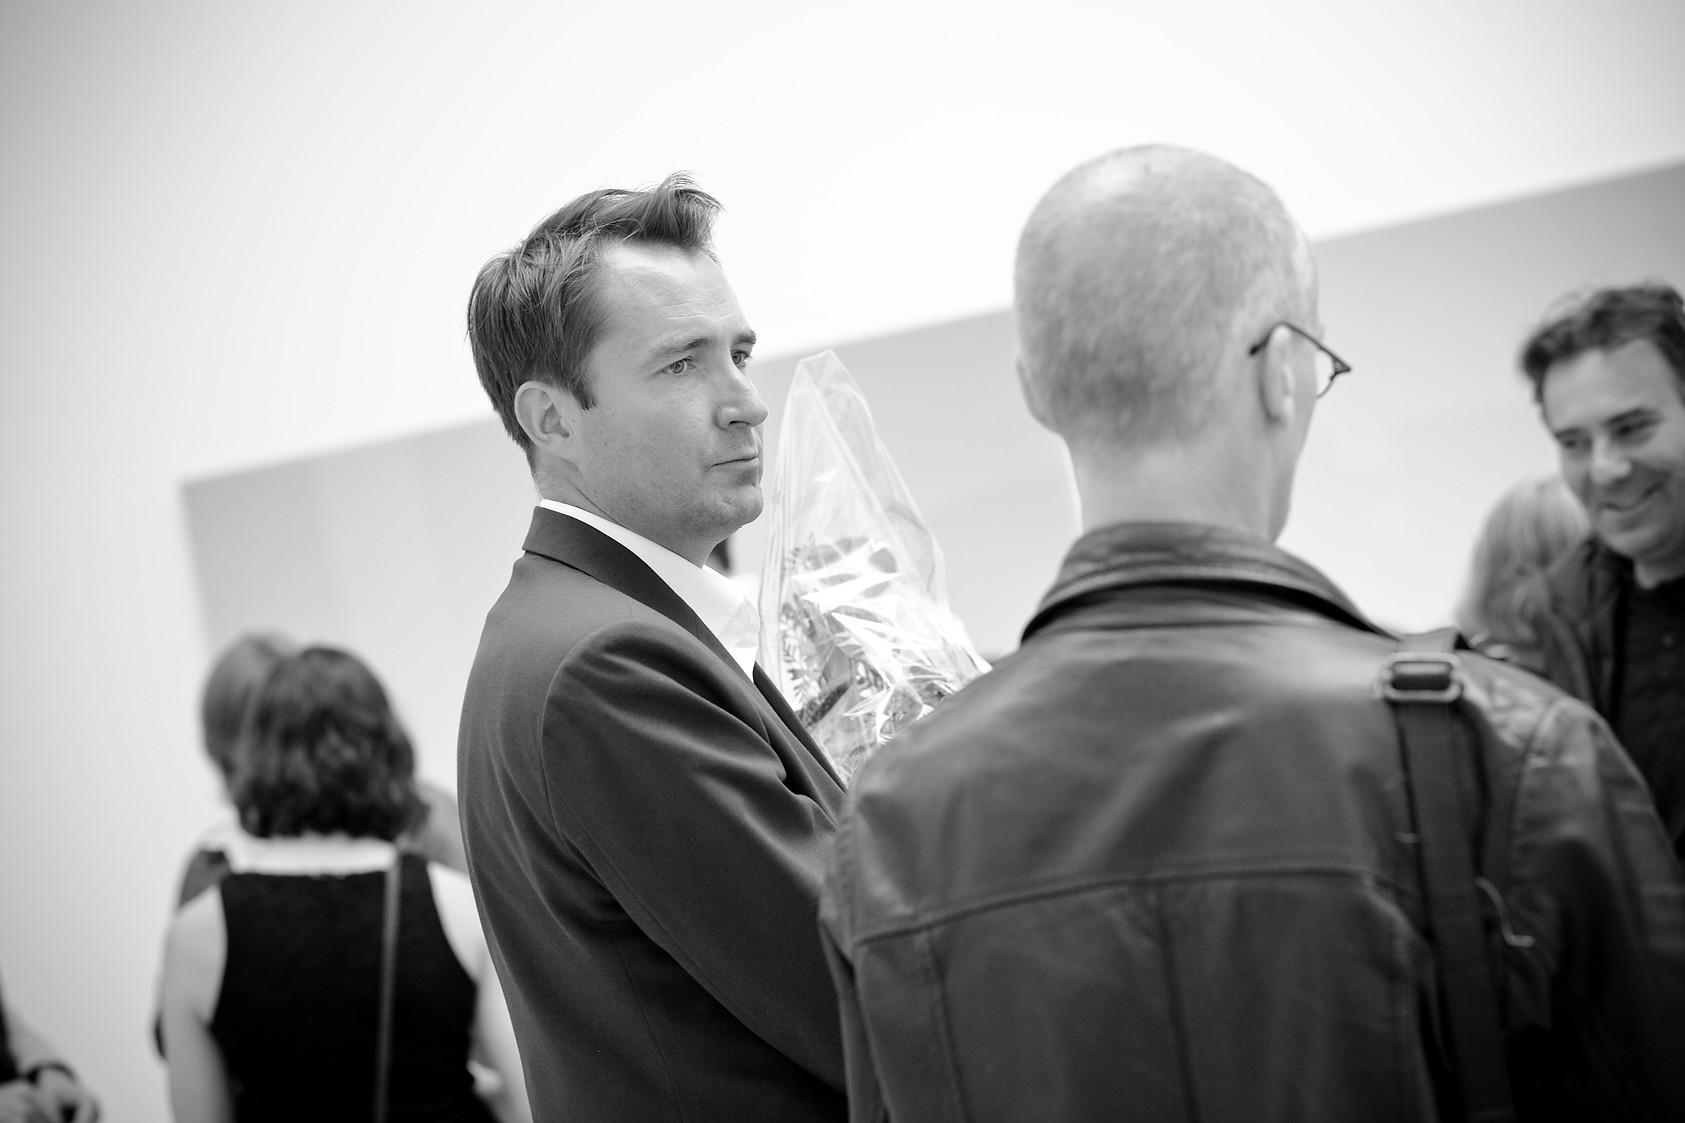 Exhibition opening // Marko Vukola // TKM Bispegata // 2012